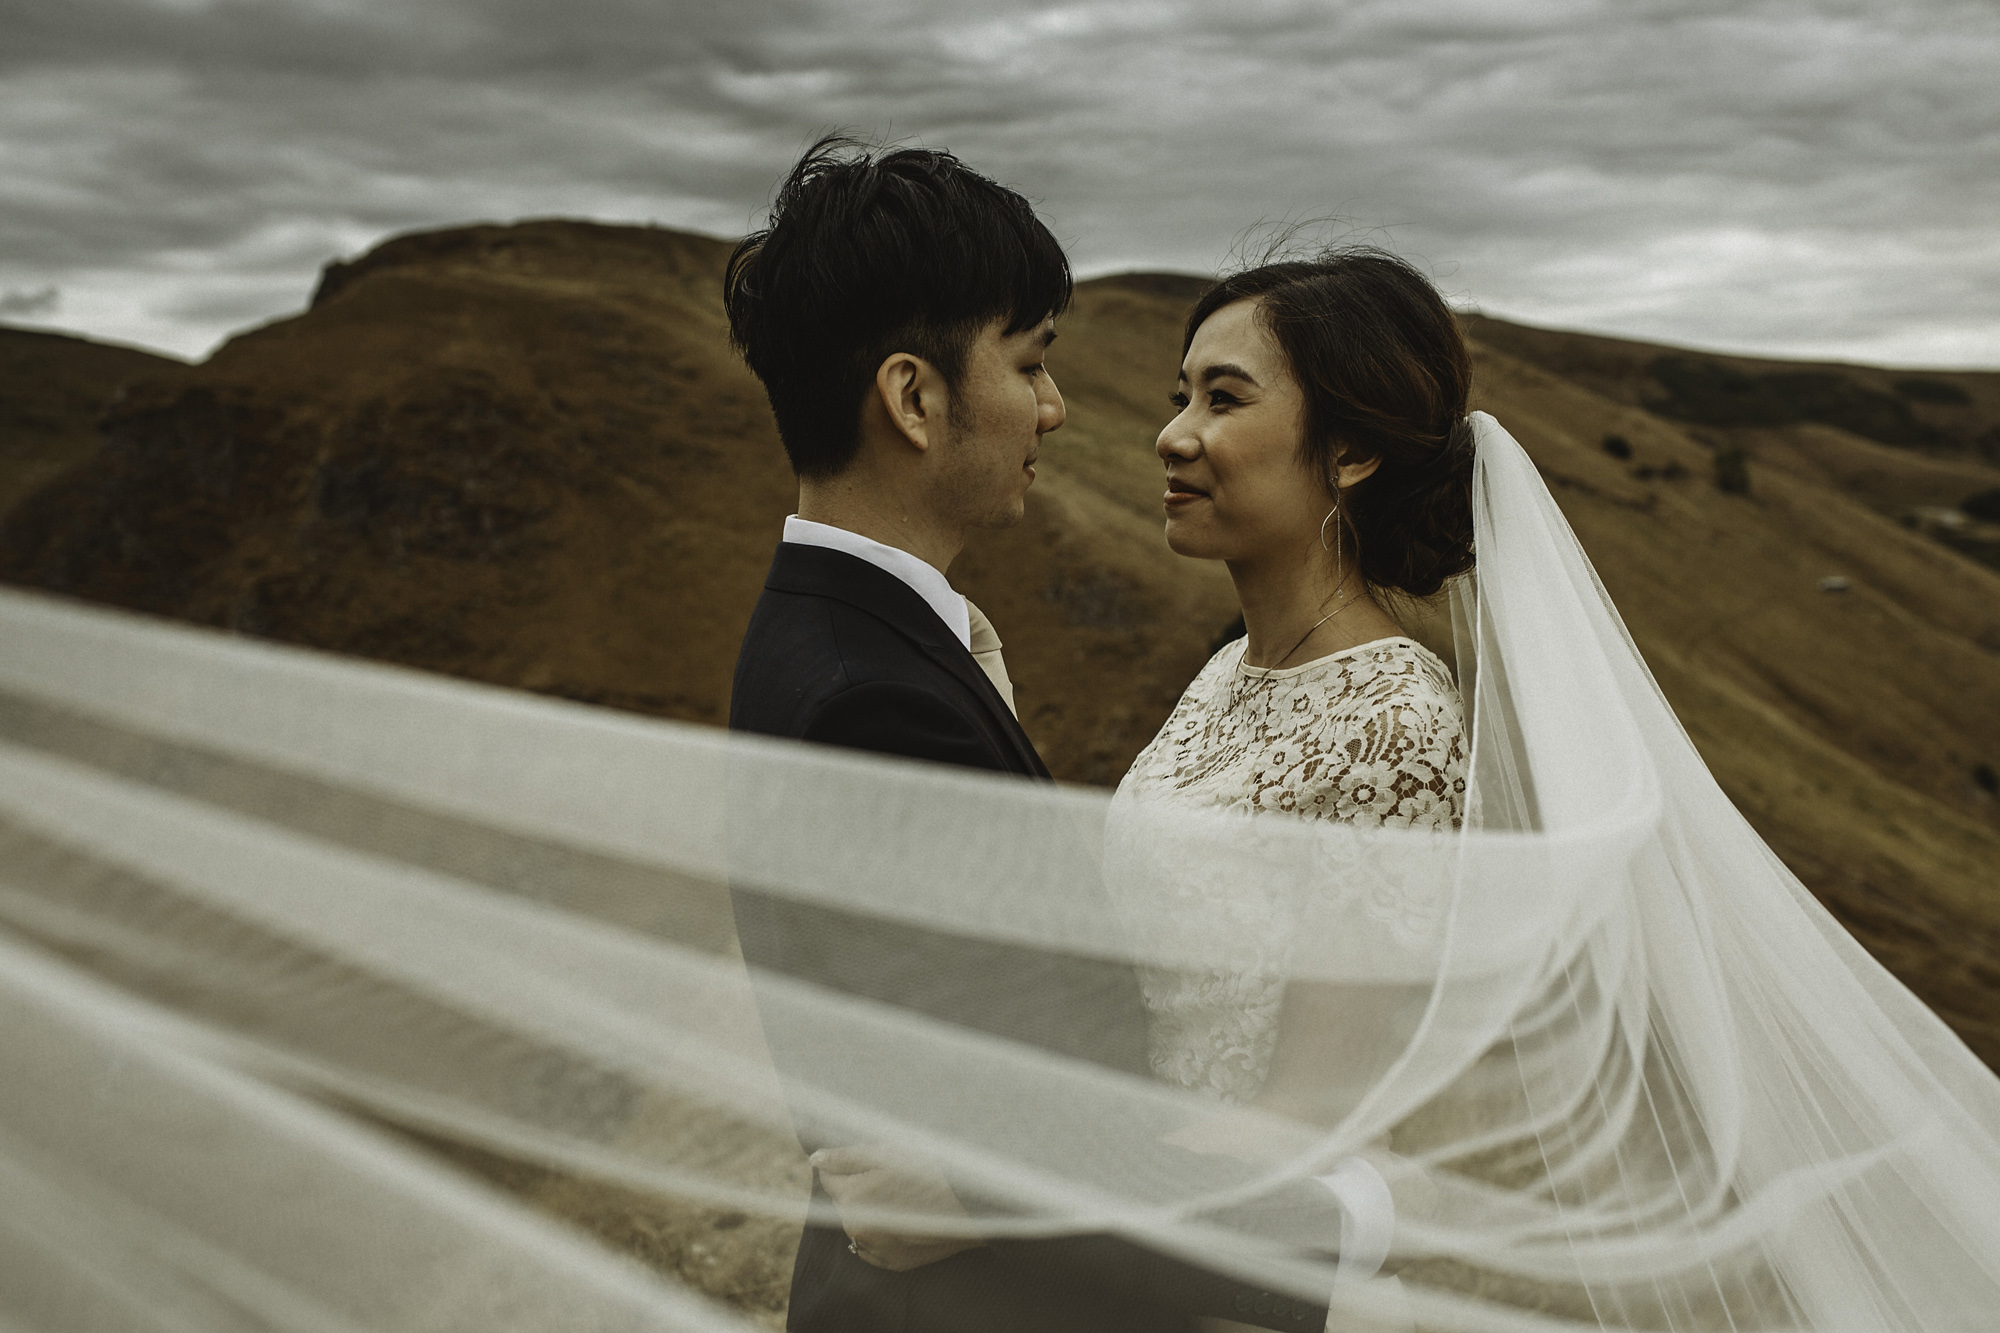 Kate-Beaumont-Wedding-Dress-Bridal-Separates-Peak-District-Shoot-2a.jpg